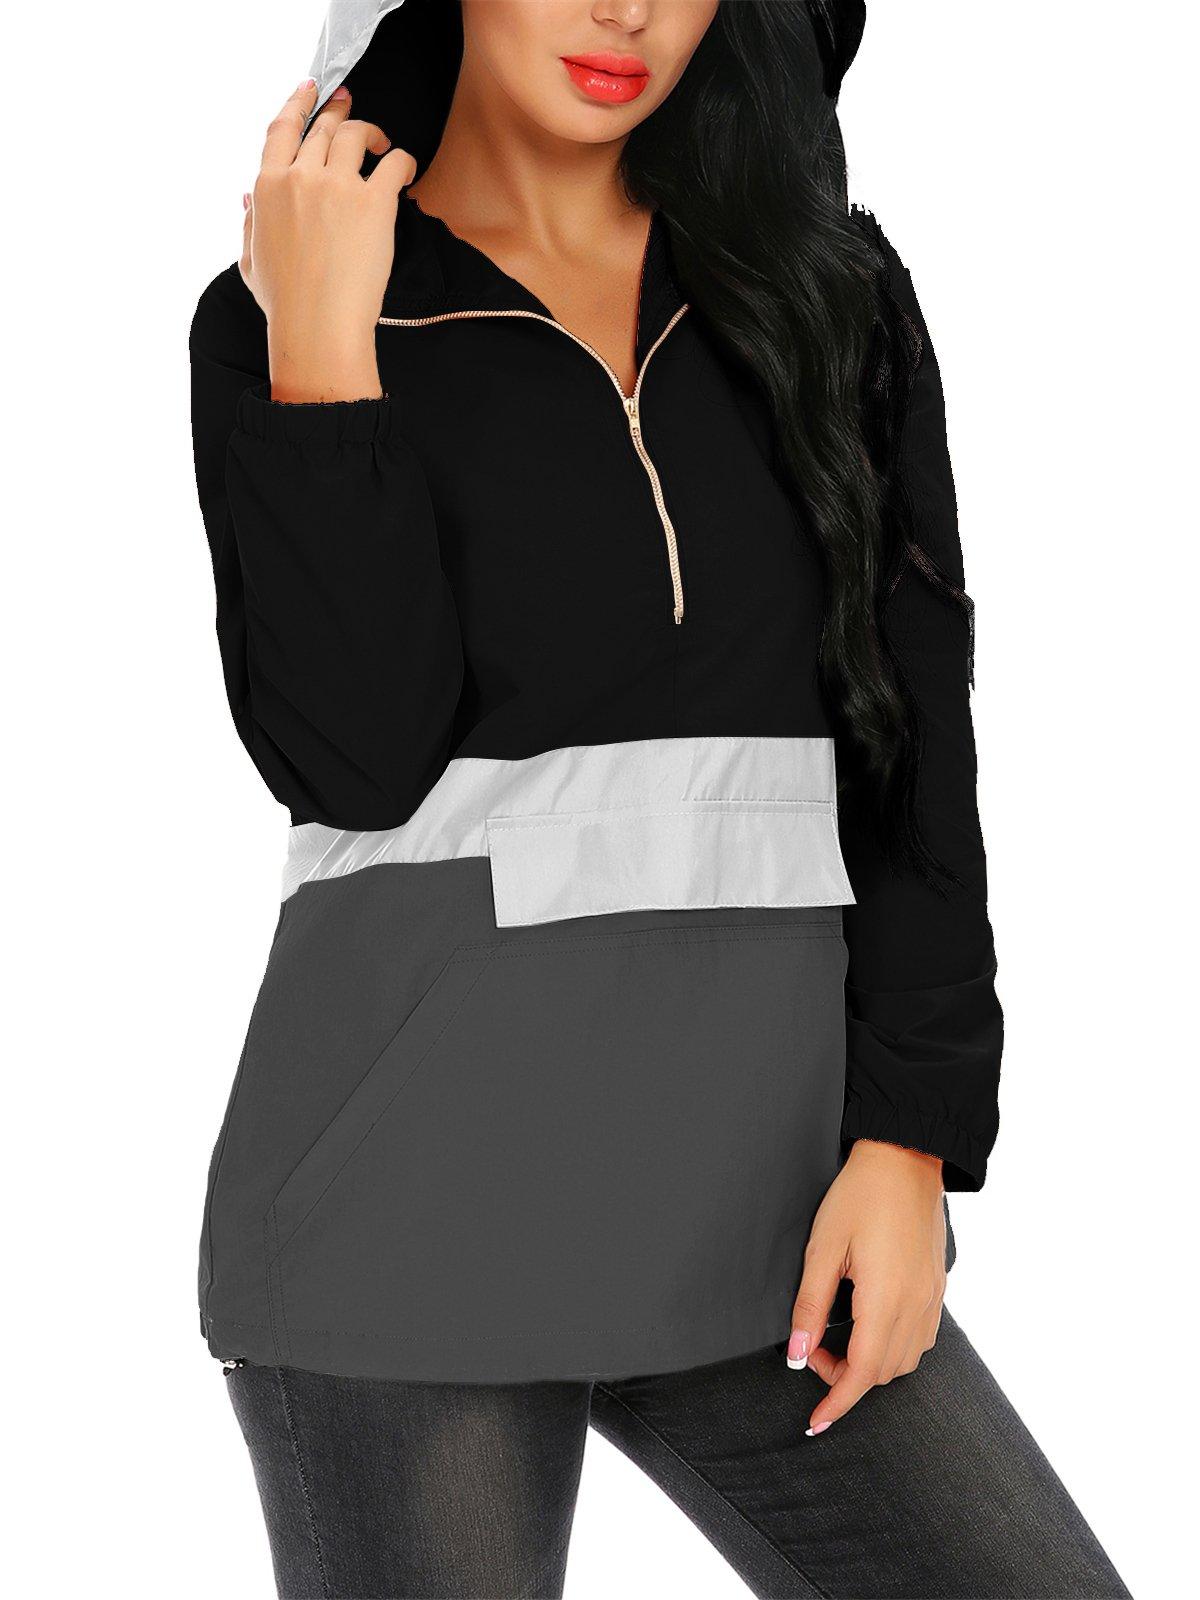 FISOUL Women Lightweight Sport Hoodie Raincoat with Pocket Active Outdoor Hooded Windbreaker Jacket Black XL